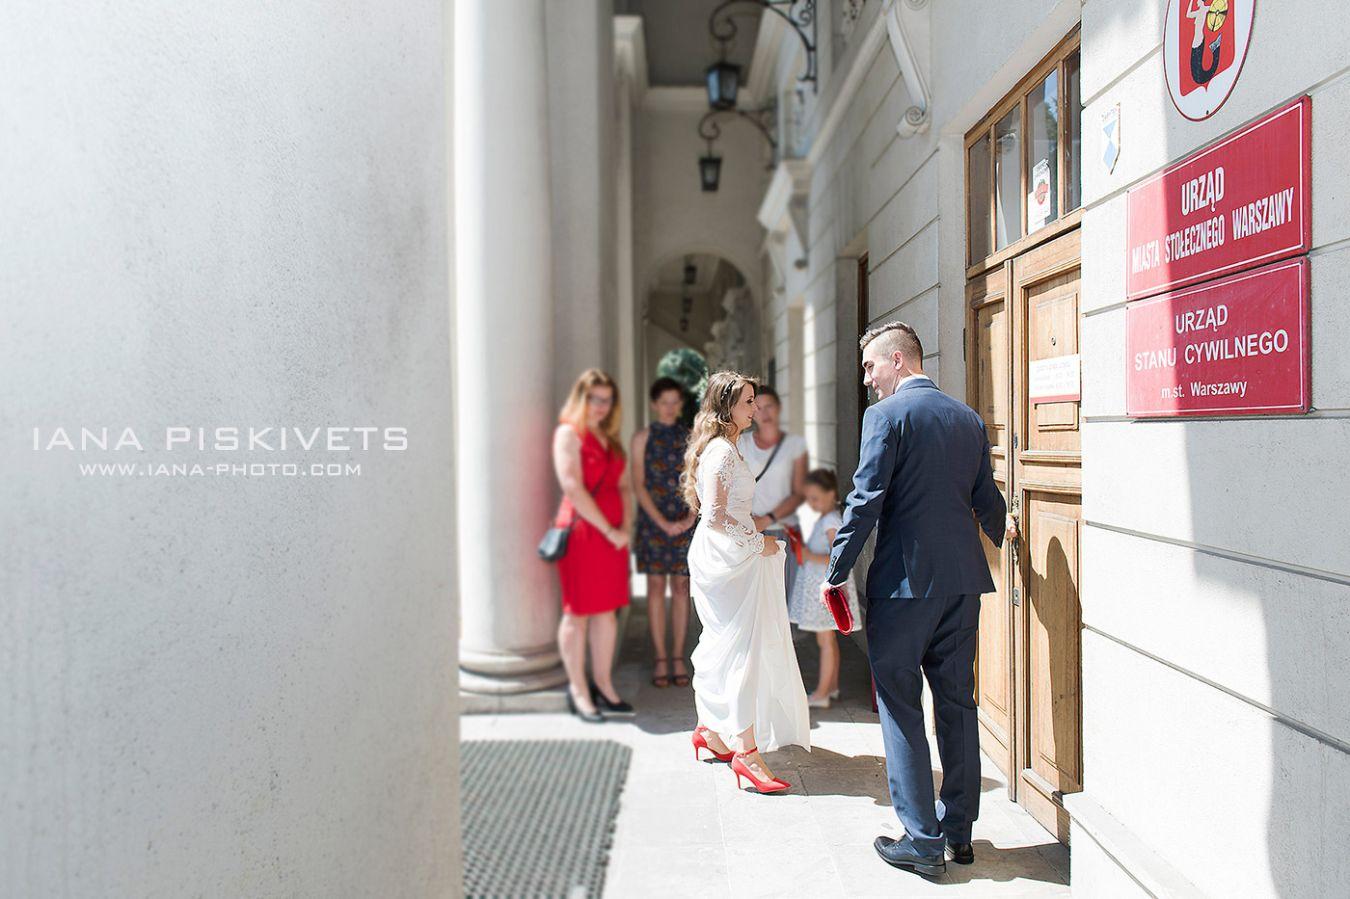 Wedding photo session by Justyna and Kazimierz